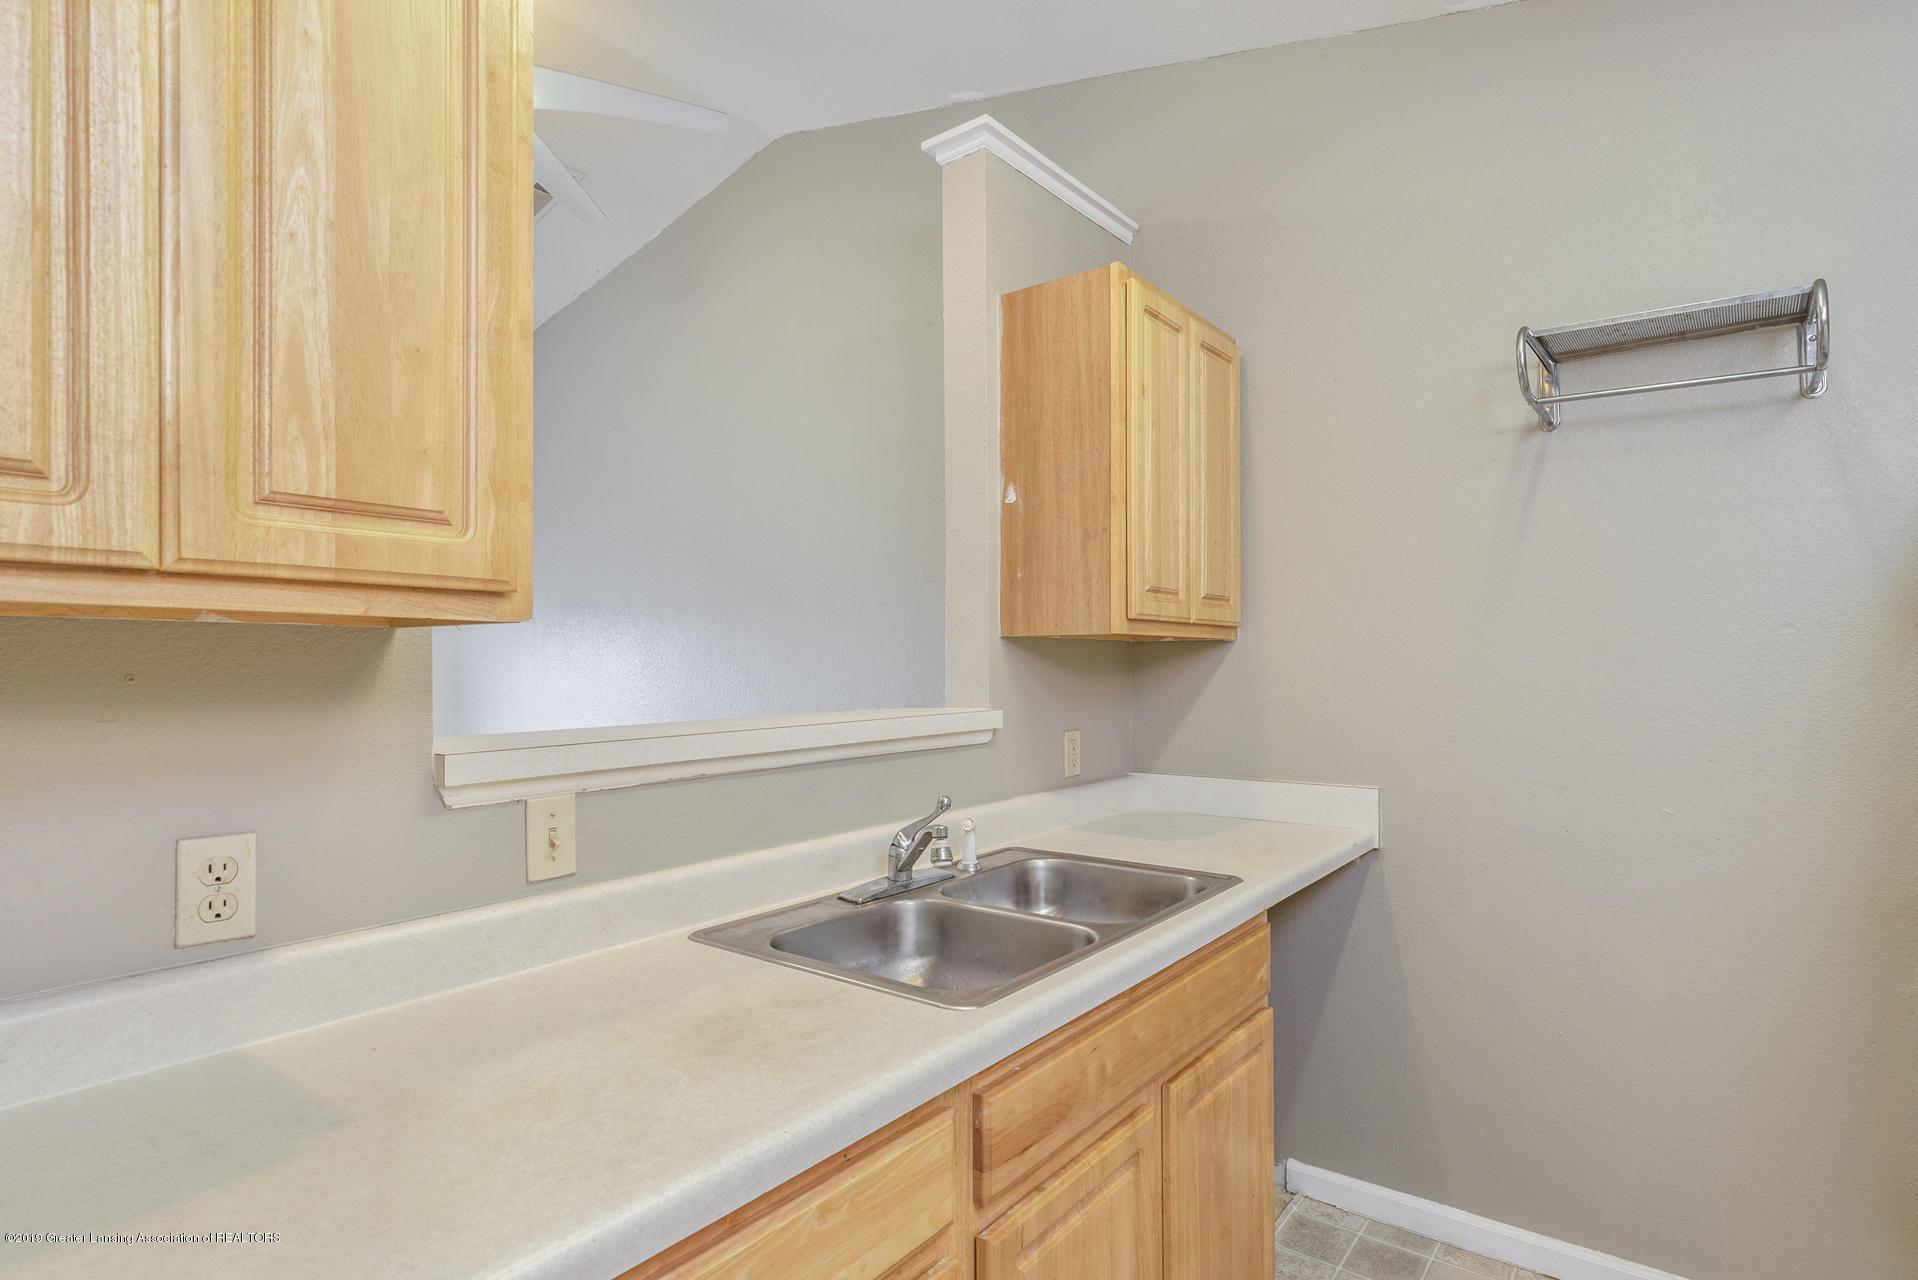 338 W Saginaw St UNIT 44 - 010-photo-kitchen-7483701 - 11